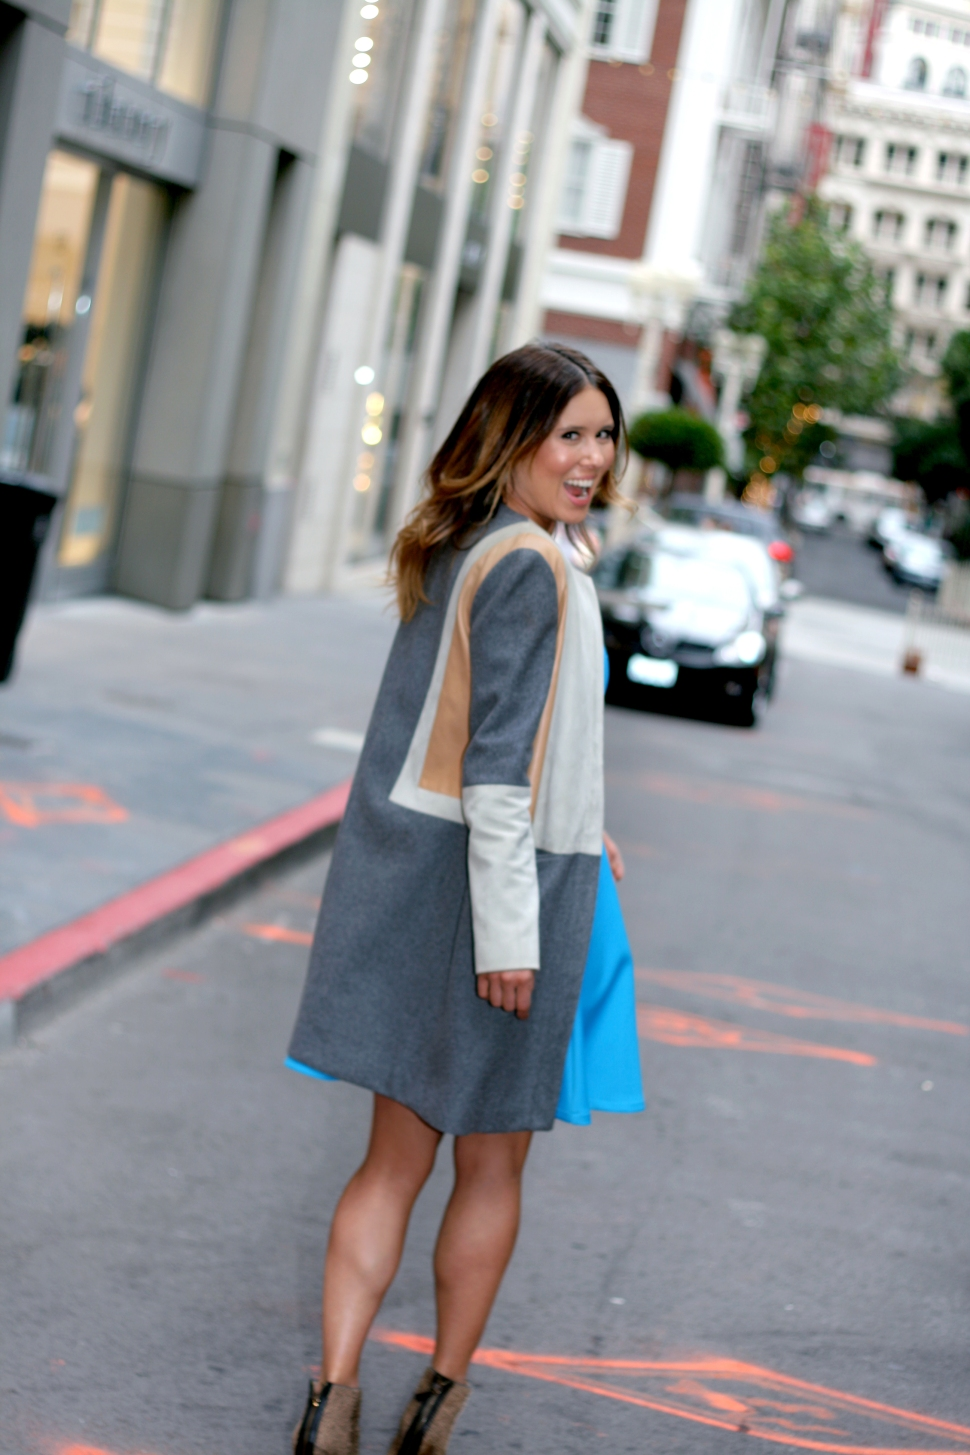 Shannon Snow, Fashion Designer, San Francisco Fashion, San Francisco Designer, Dress Designer, Workwear, Fashion Blogger, Fashion Designer Feature, San Francisco Style, Maiden Lane, Twitter Blue, Street Style,